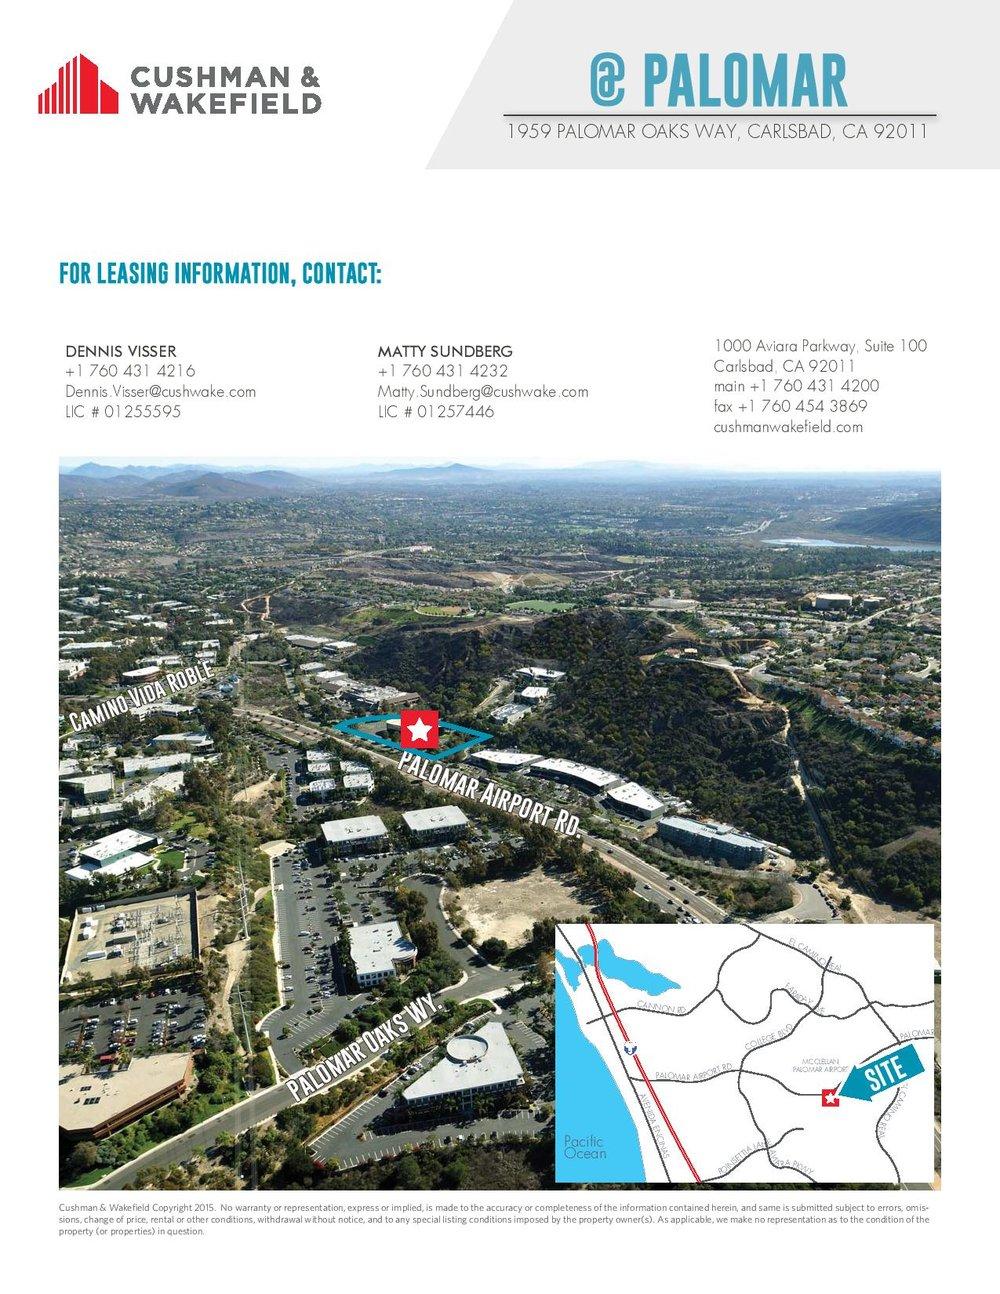 1959 Palomar flyer-page-005 (1).jpg